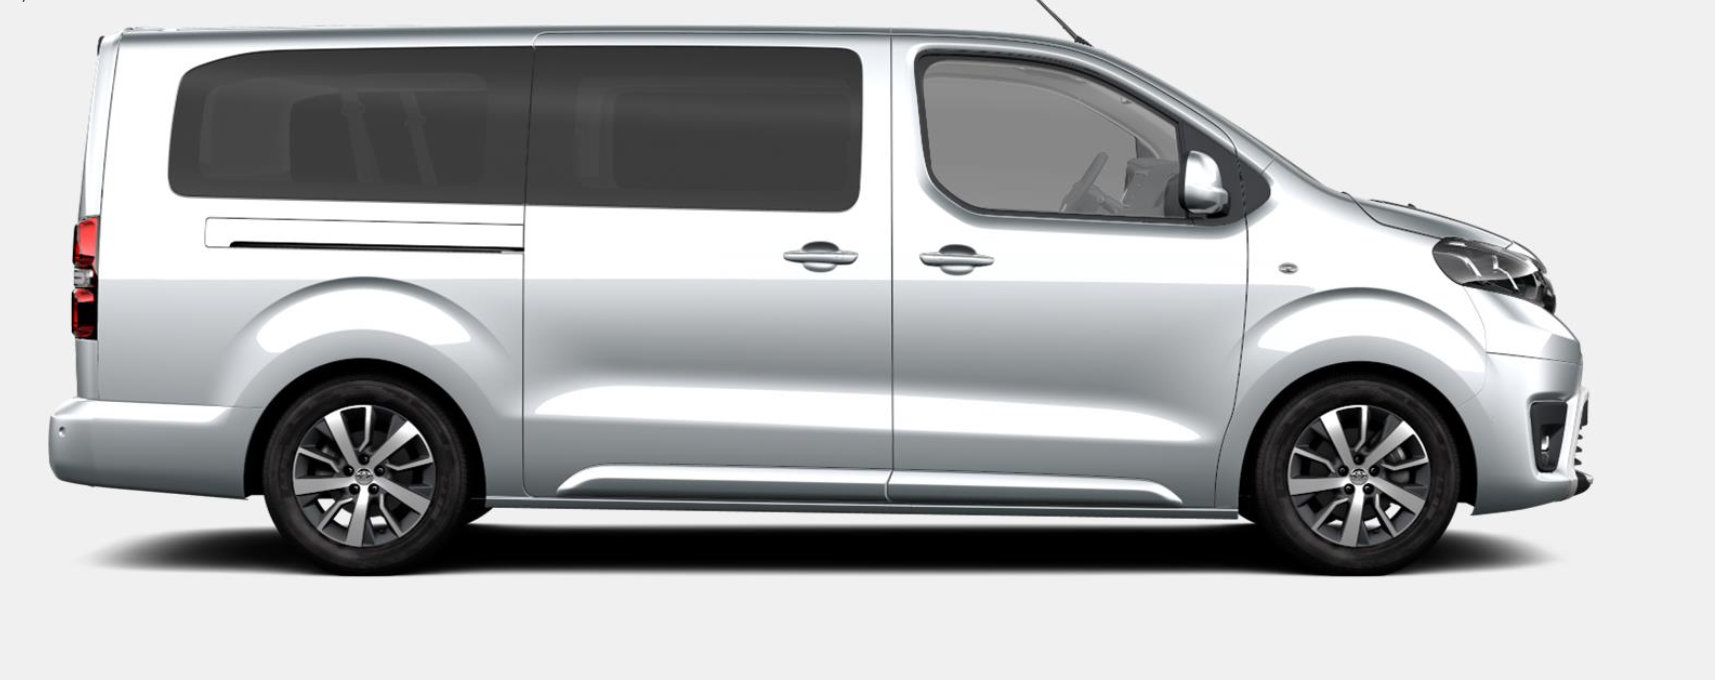 Toyota-Proace-Verso-leasen-2